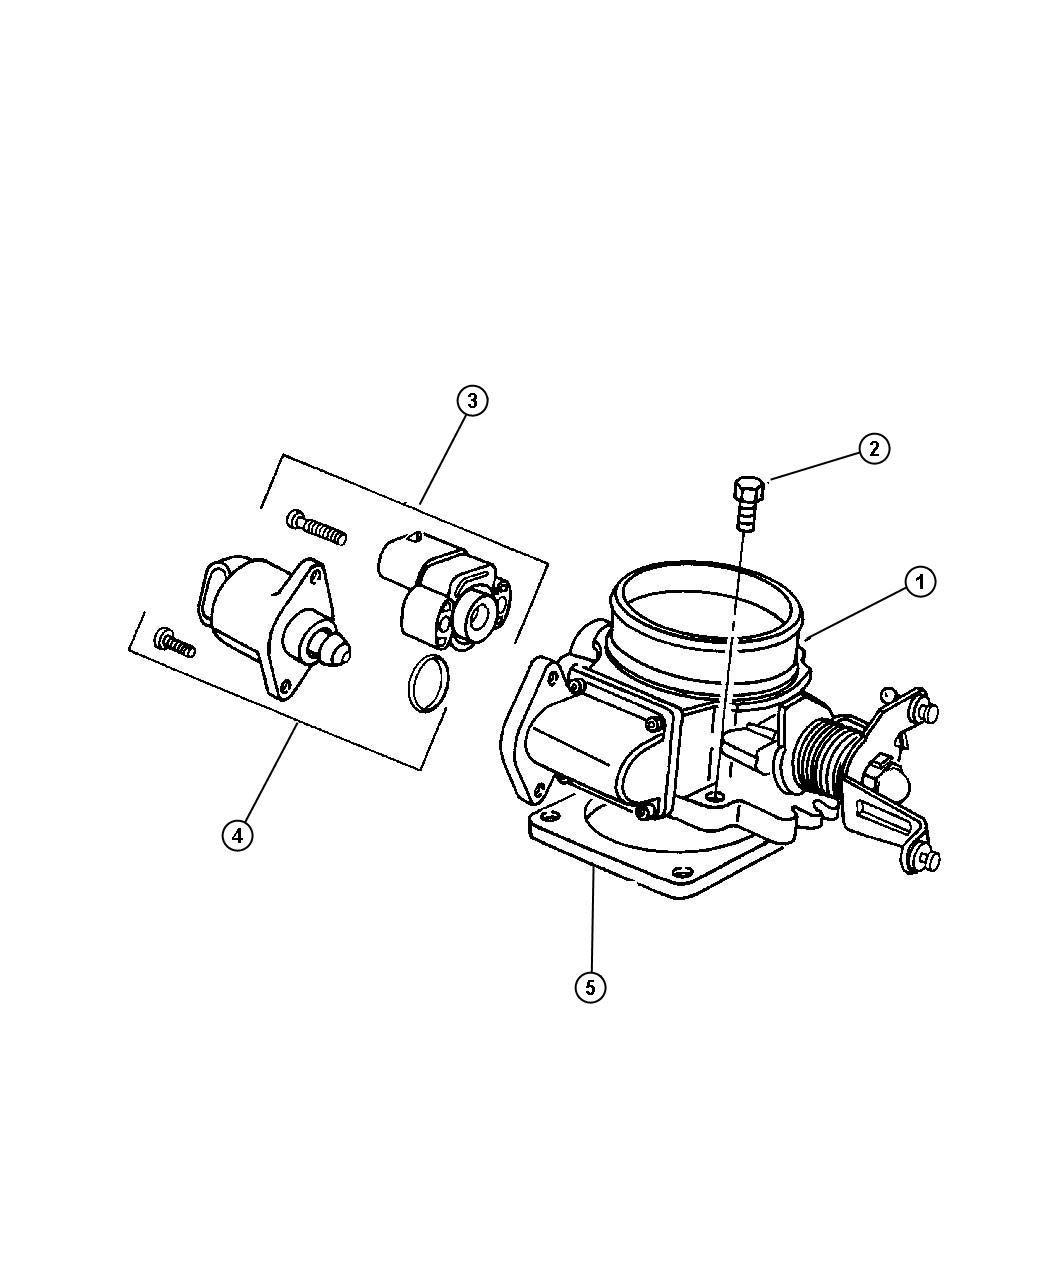 Mopar 5300 7543AB, Fuel Injection Throttle Body Mounting Gasket